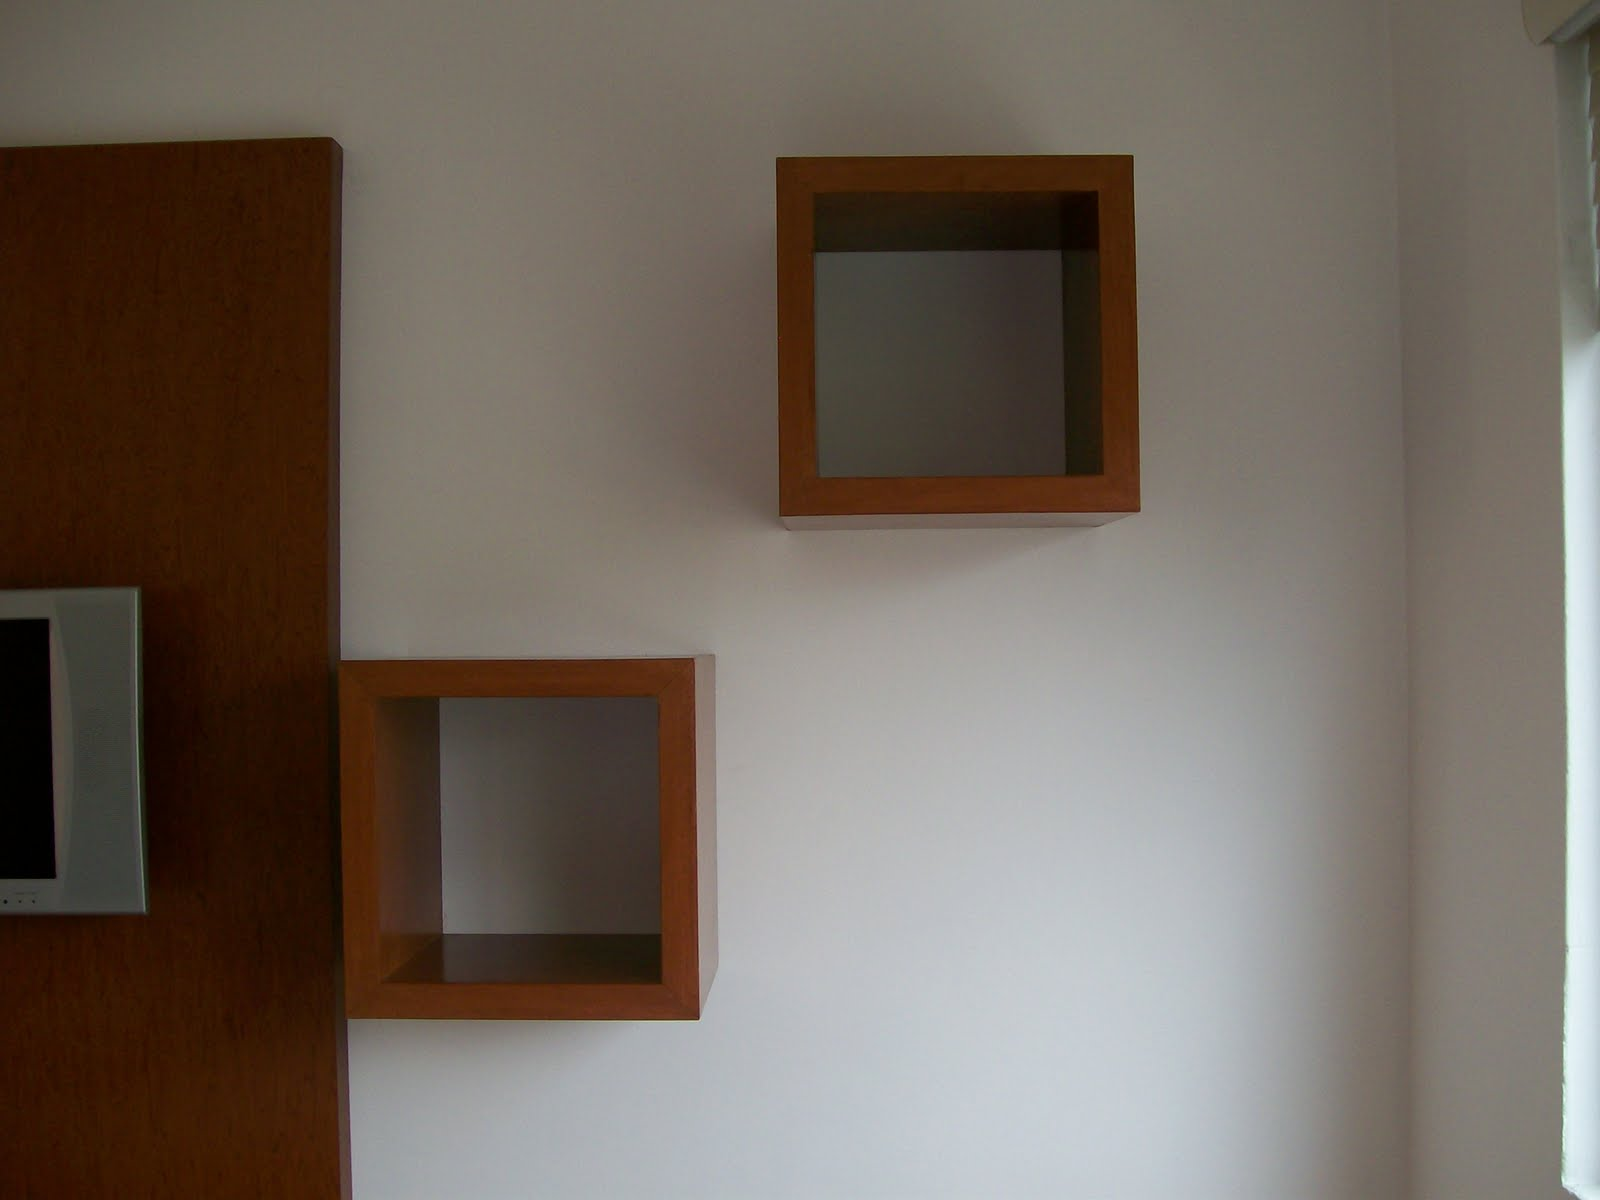 Venta mueble esquinero para tv o libros for Como hacer muebles modernos